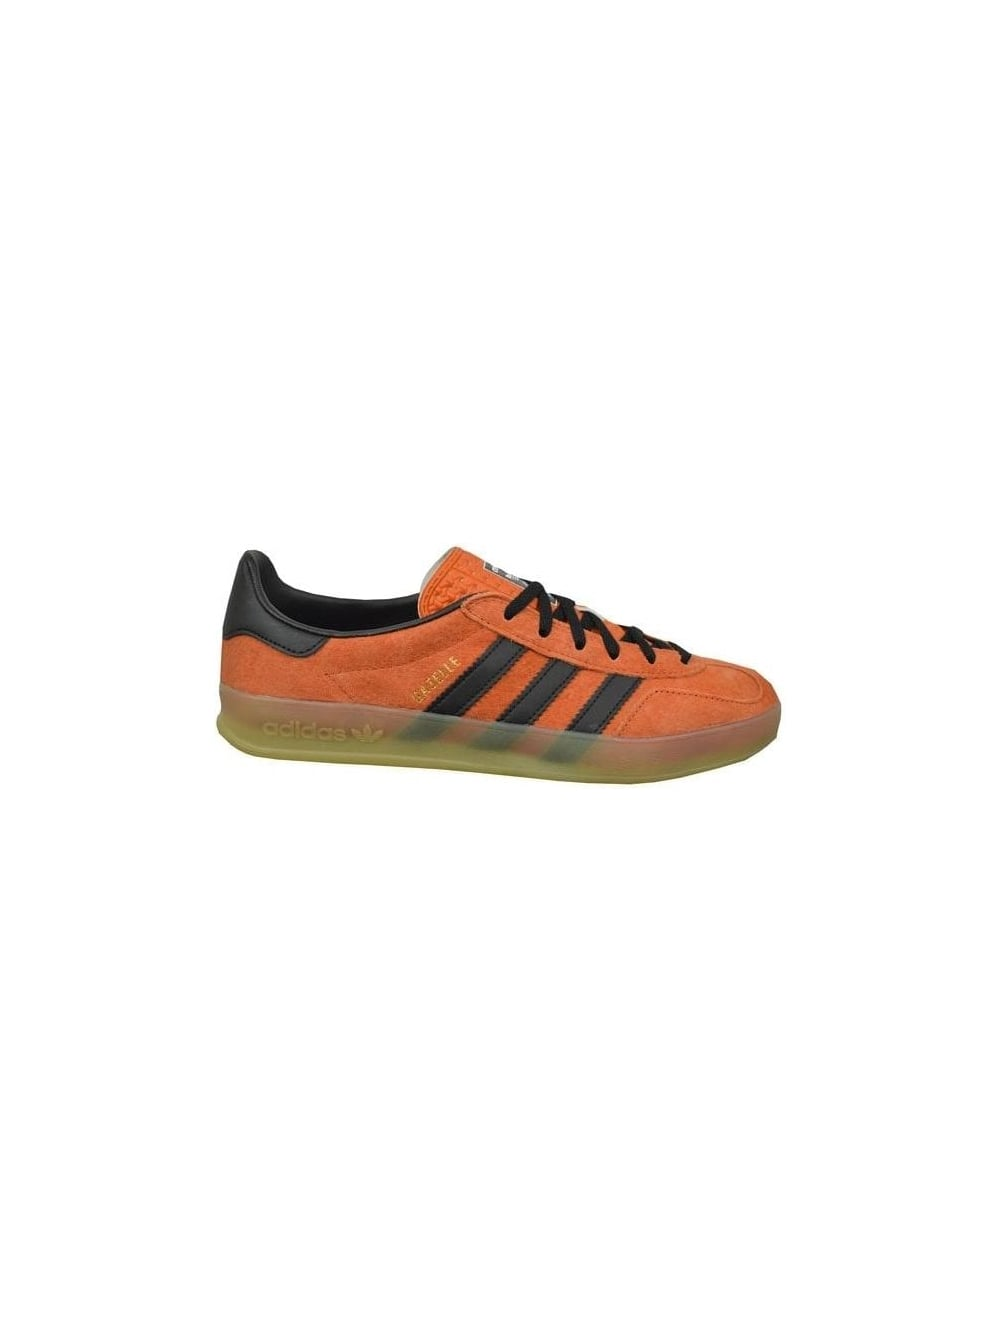 nouveau style 3ab91 557db Gazelle Indoor Trainer - Craft Orange